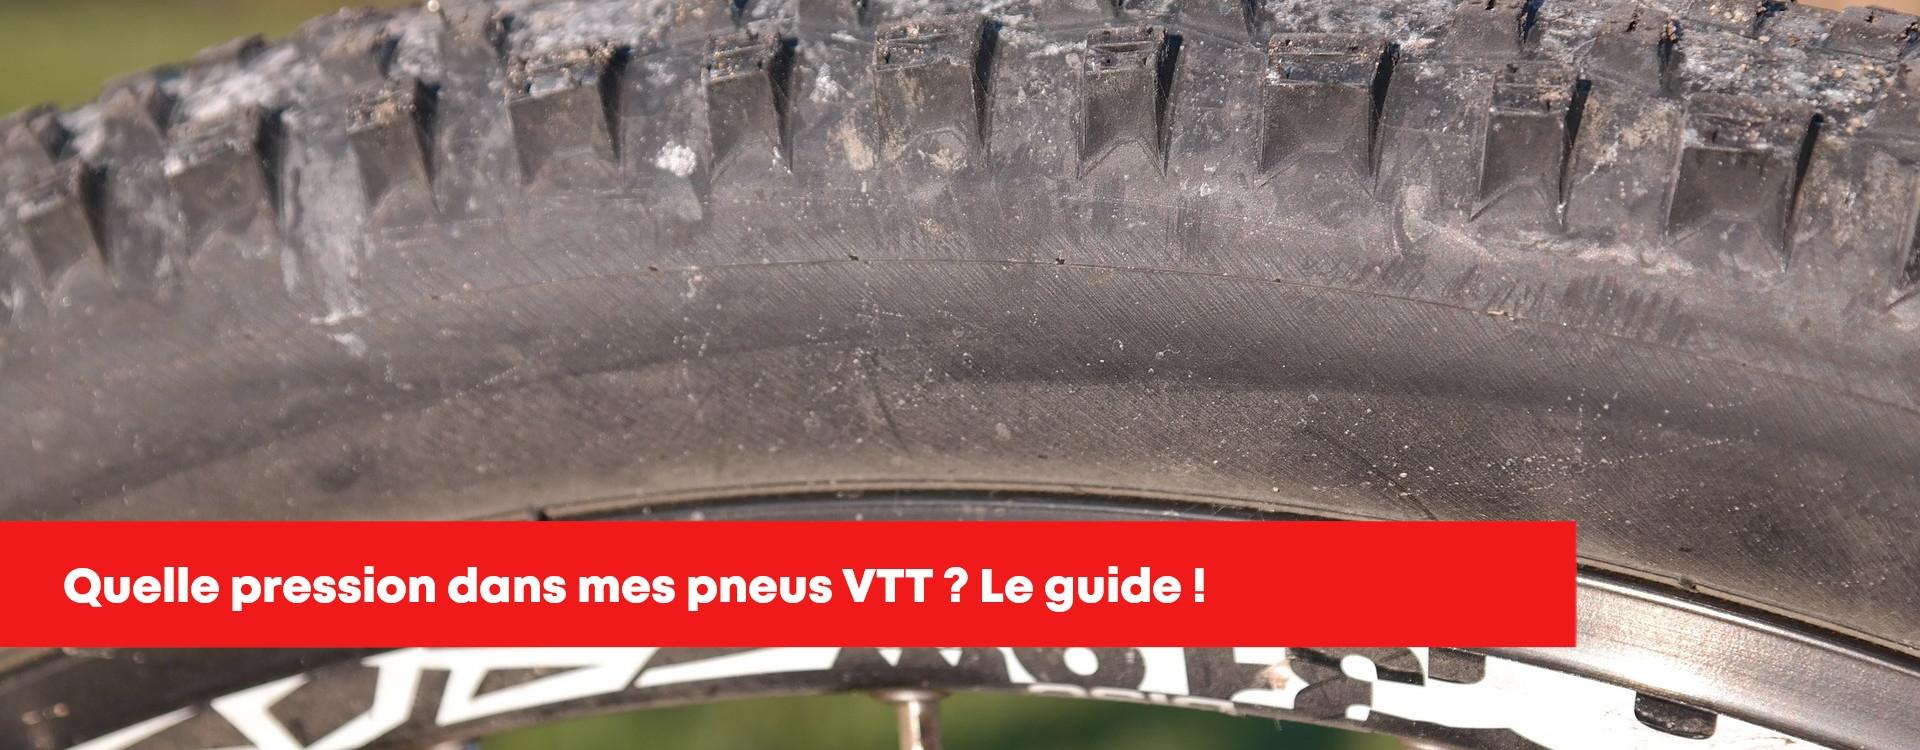 Pression, gonflage pneu VTT et vélo - Notre guide